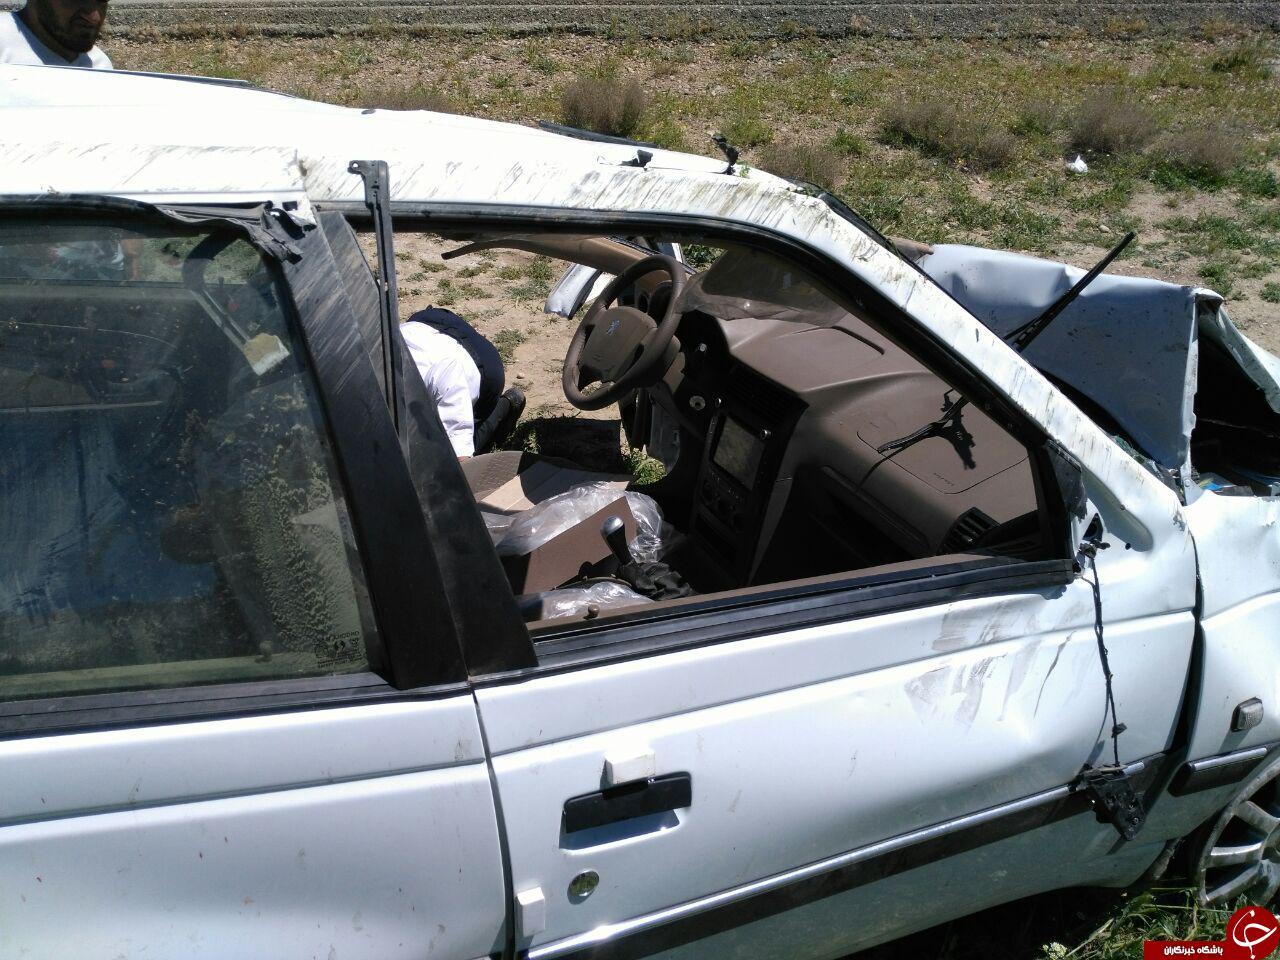 واژگونی هولناک پژو 405 / ایربگ خودرو عمل نکرد! + فیلم وتصاویر